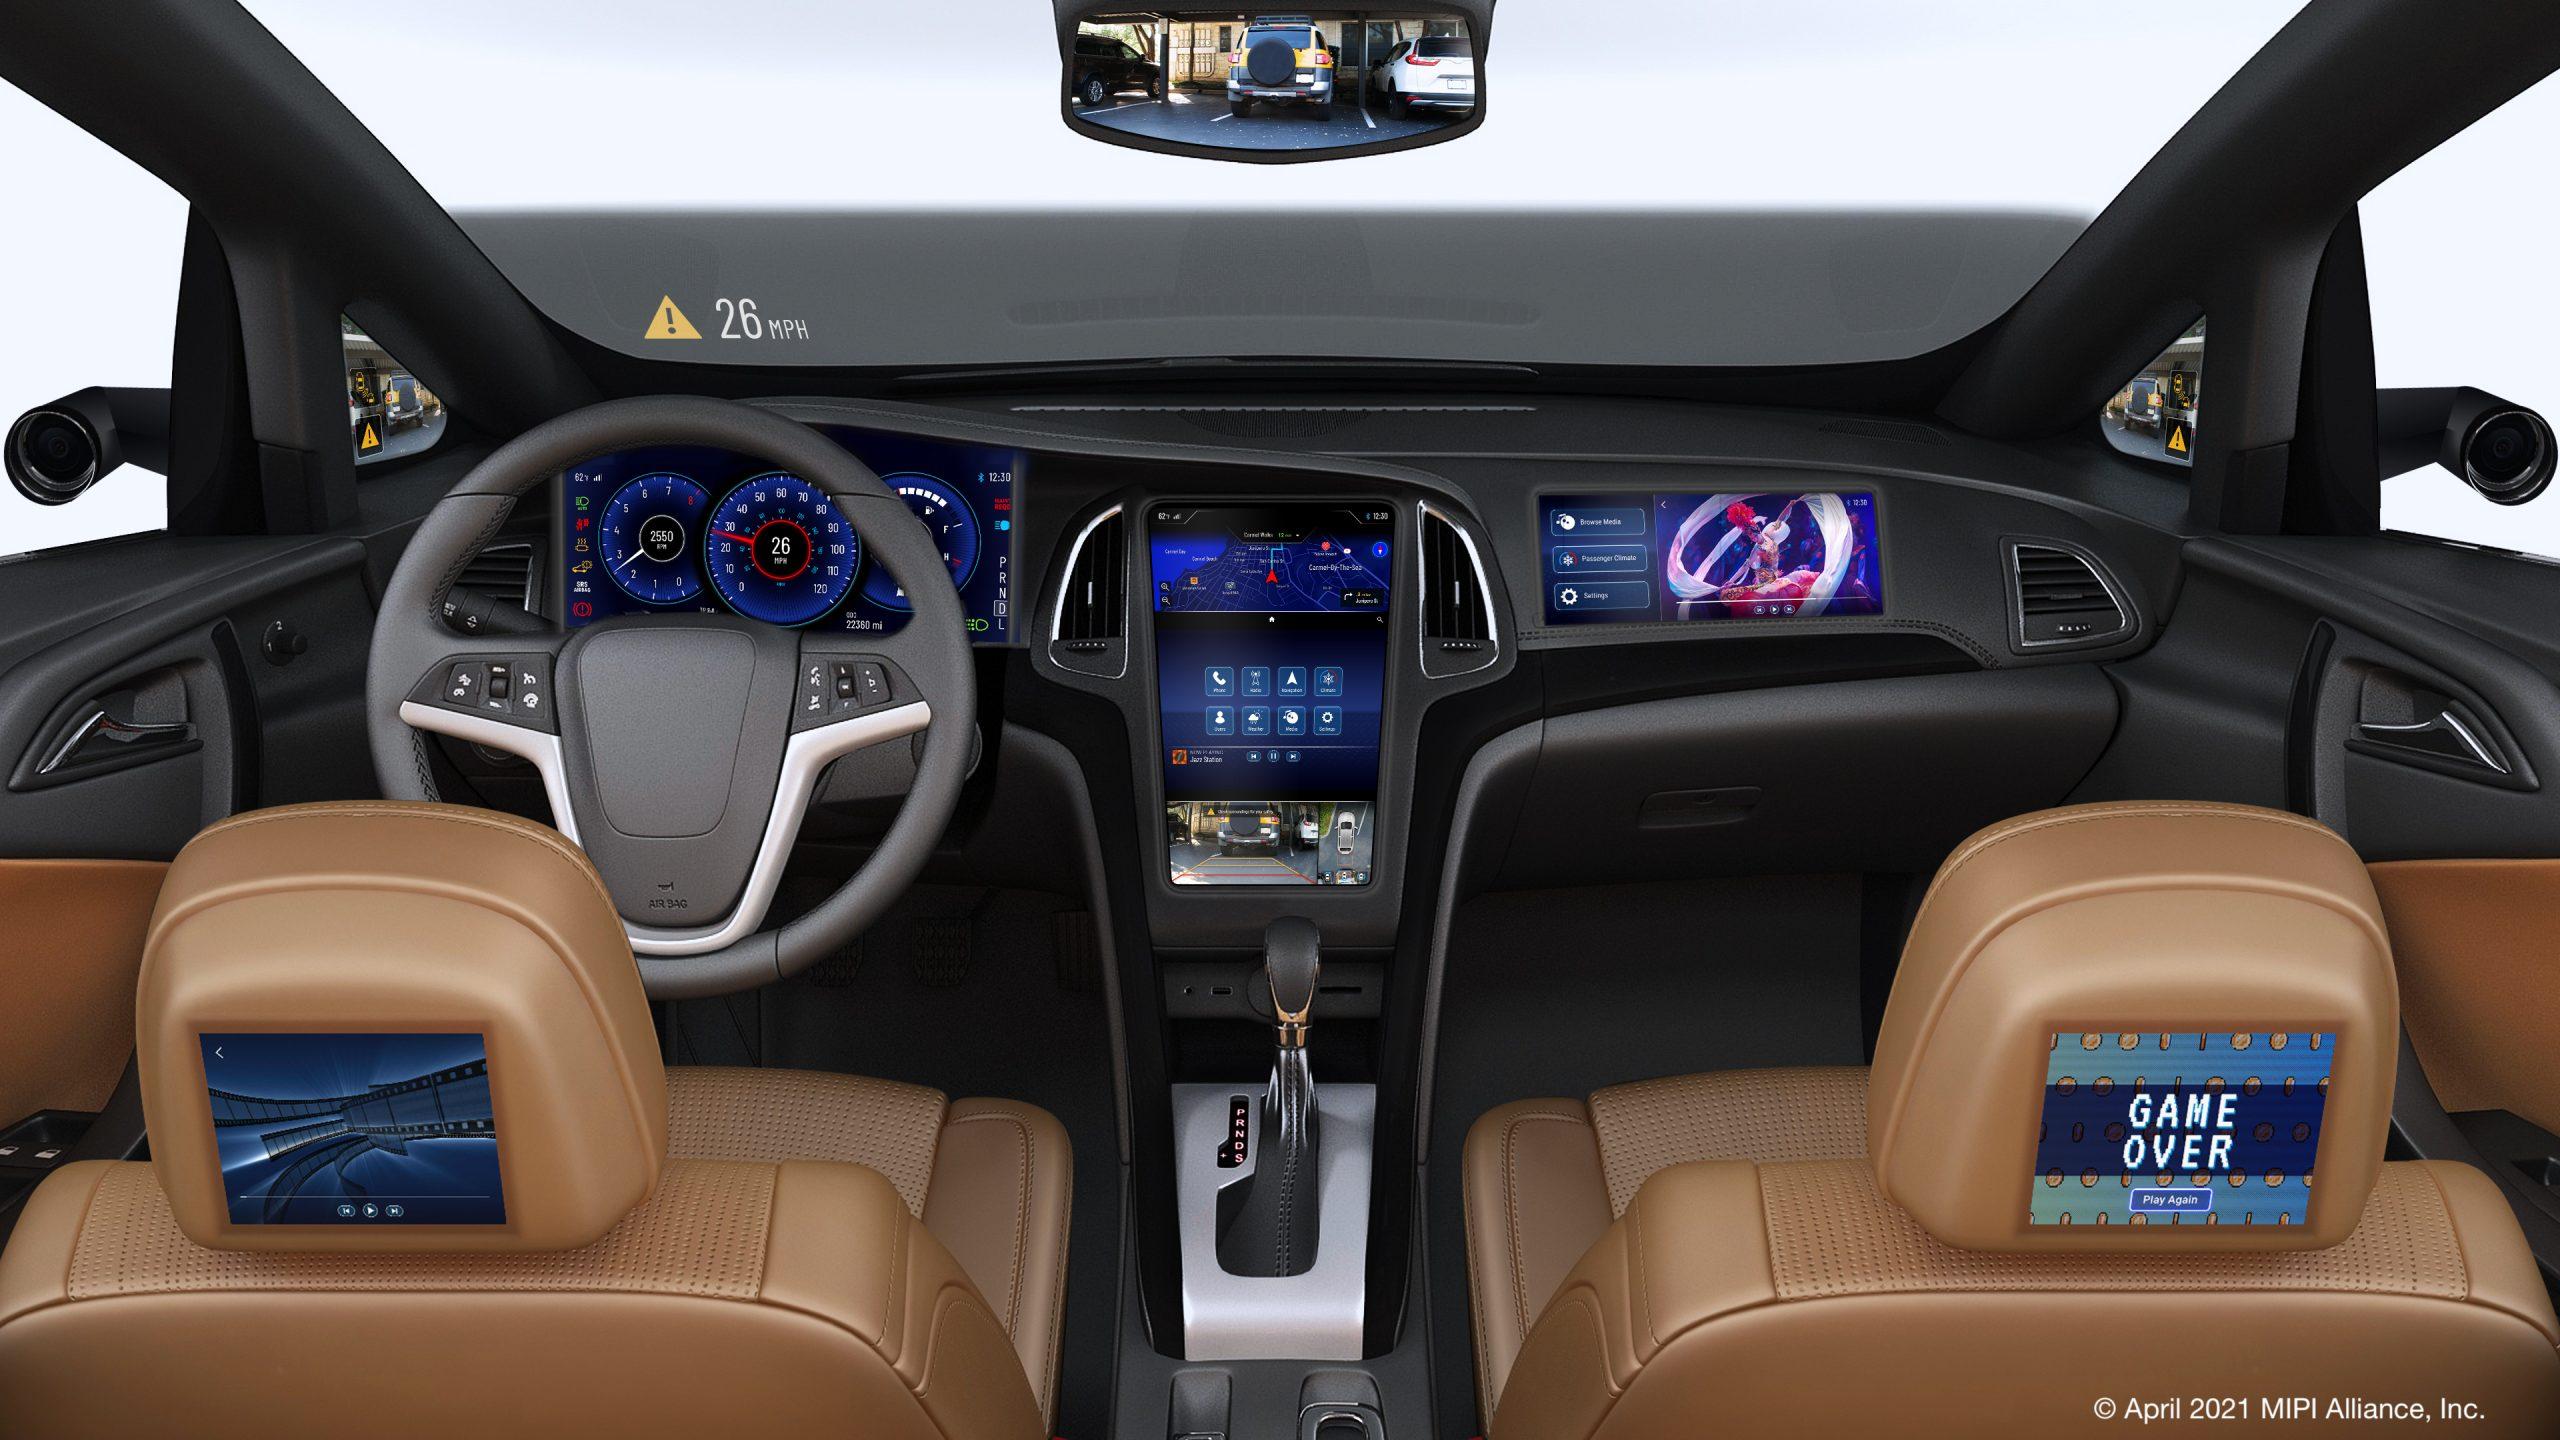 Automotive Interior Displays